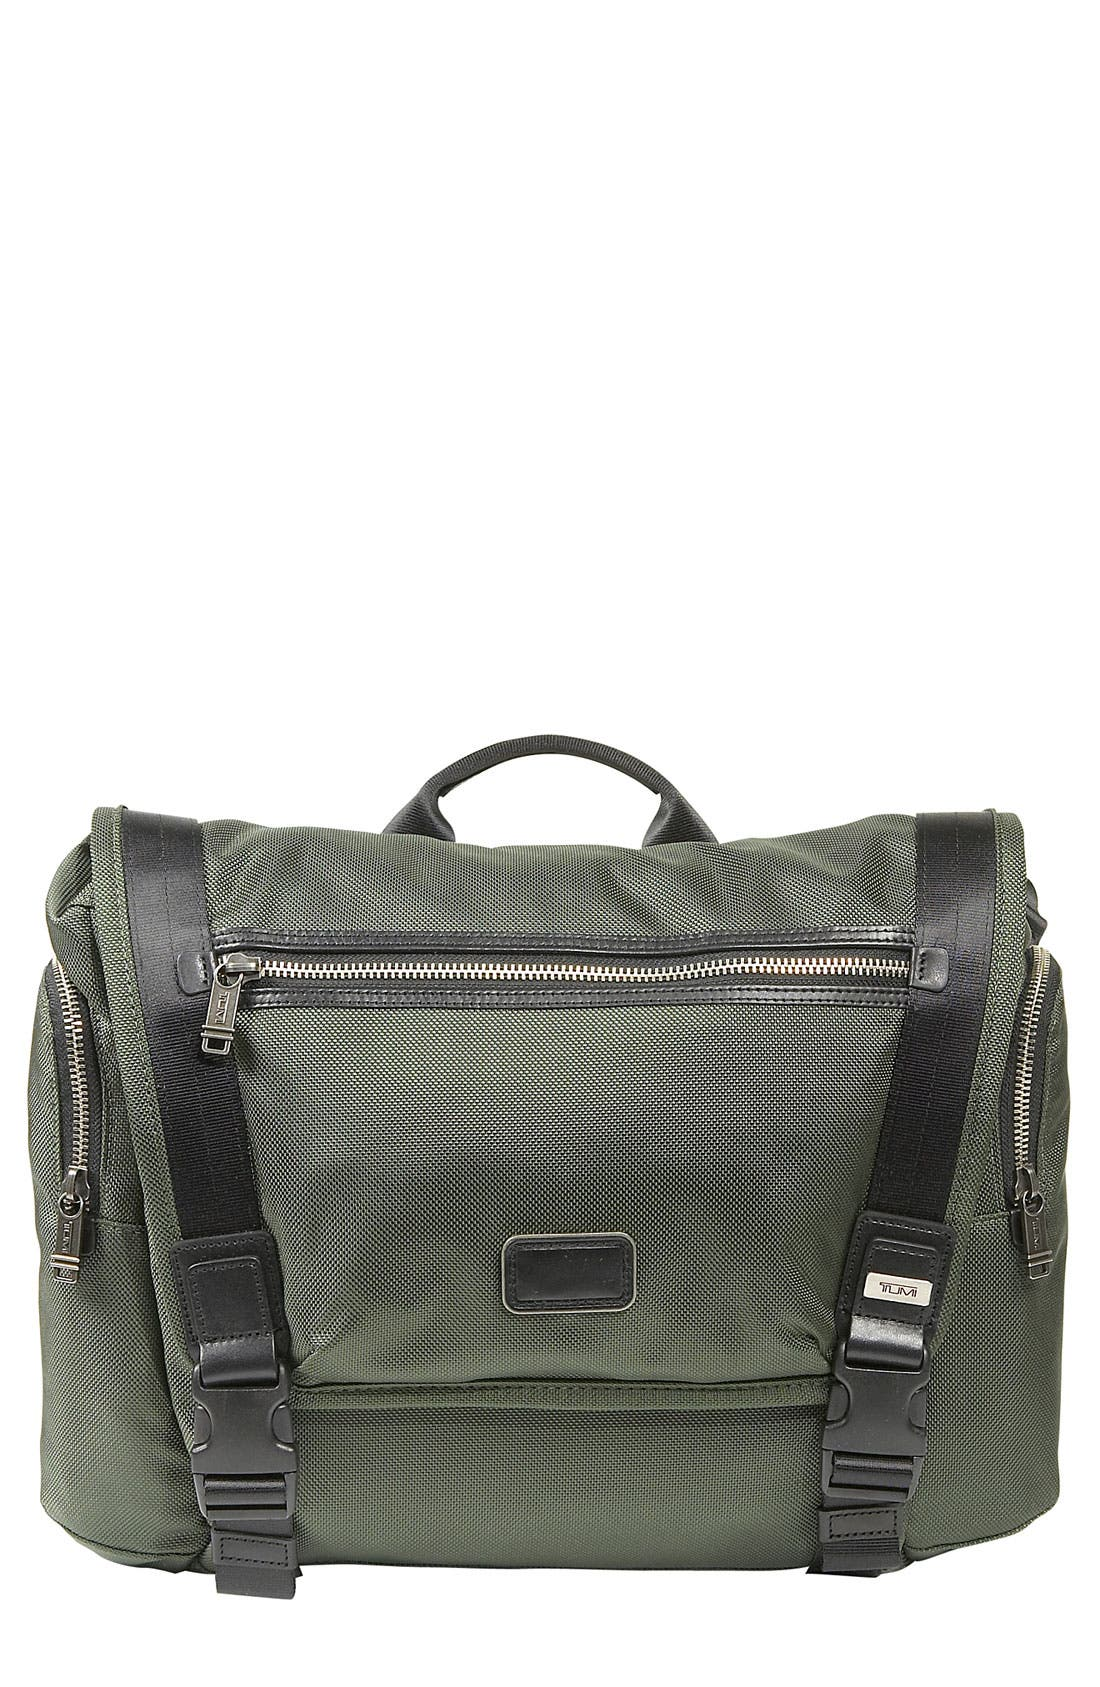 Main Image - Tumi 'Alpha Bravo - Benning' Deluxe Messenger Bag